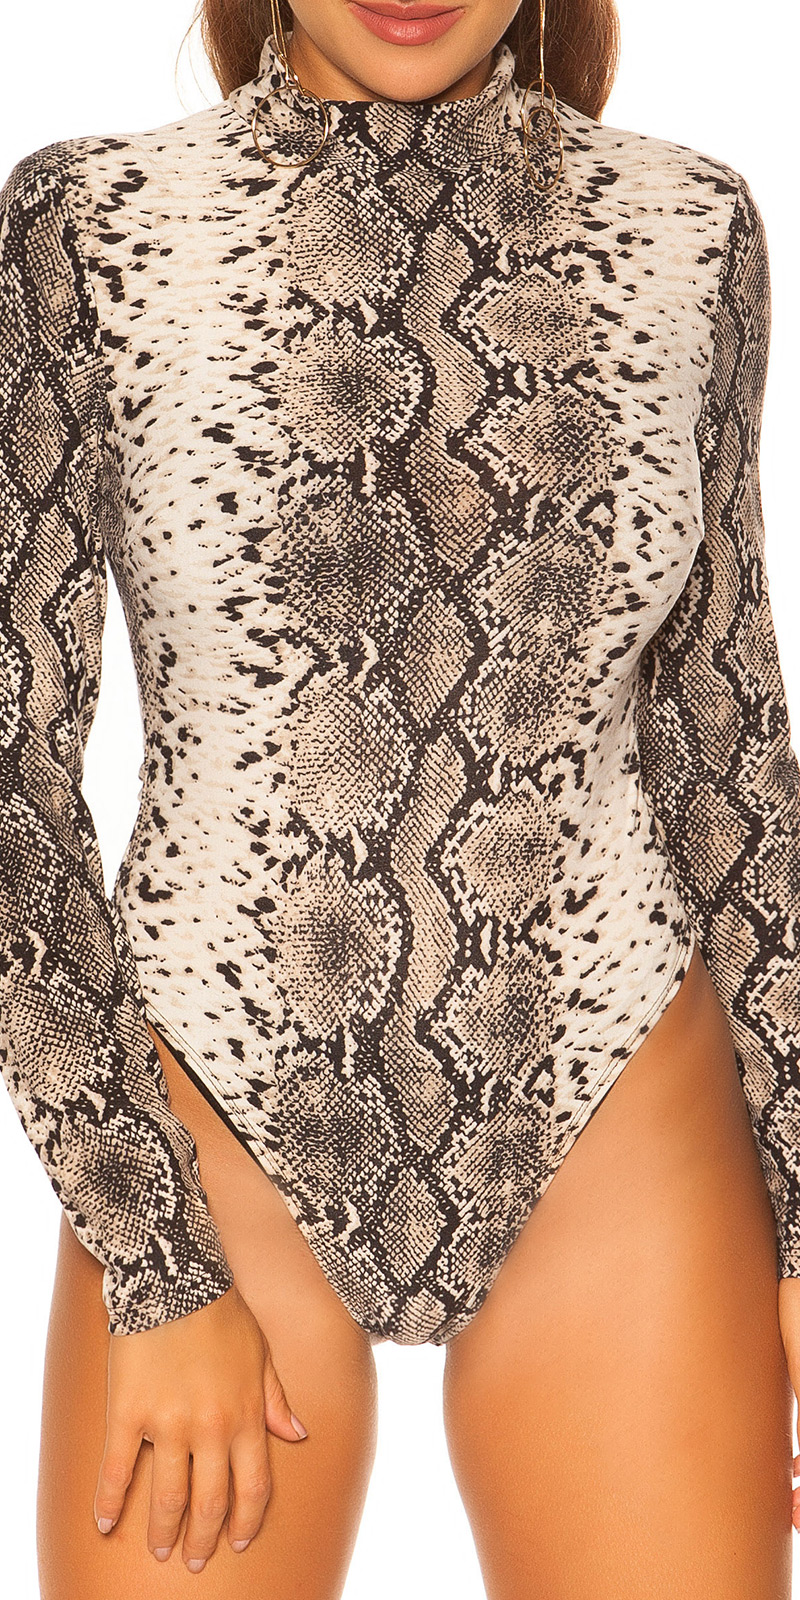 Helanca Body sexy print leopard